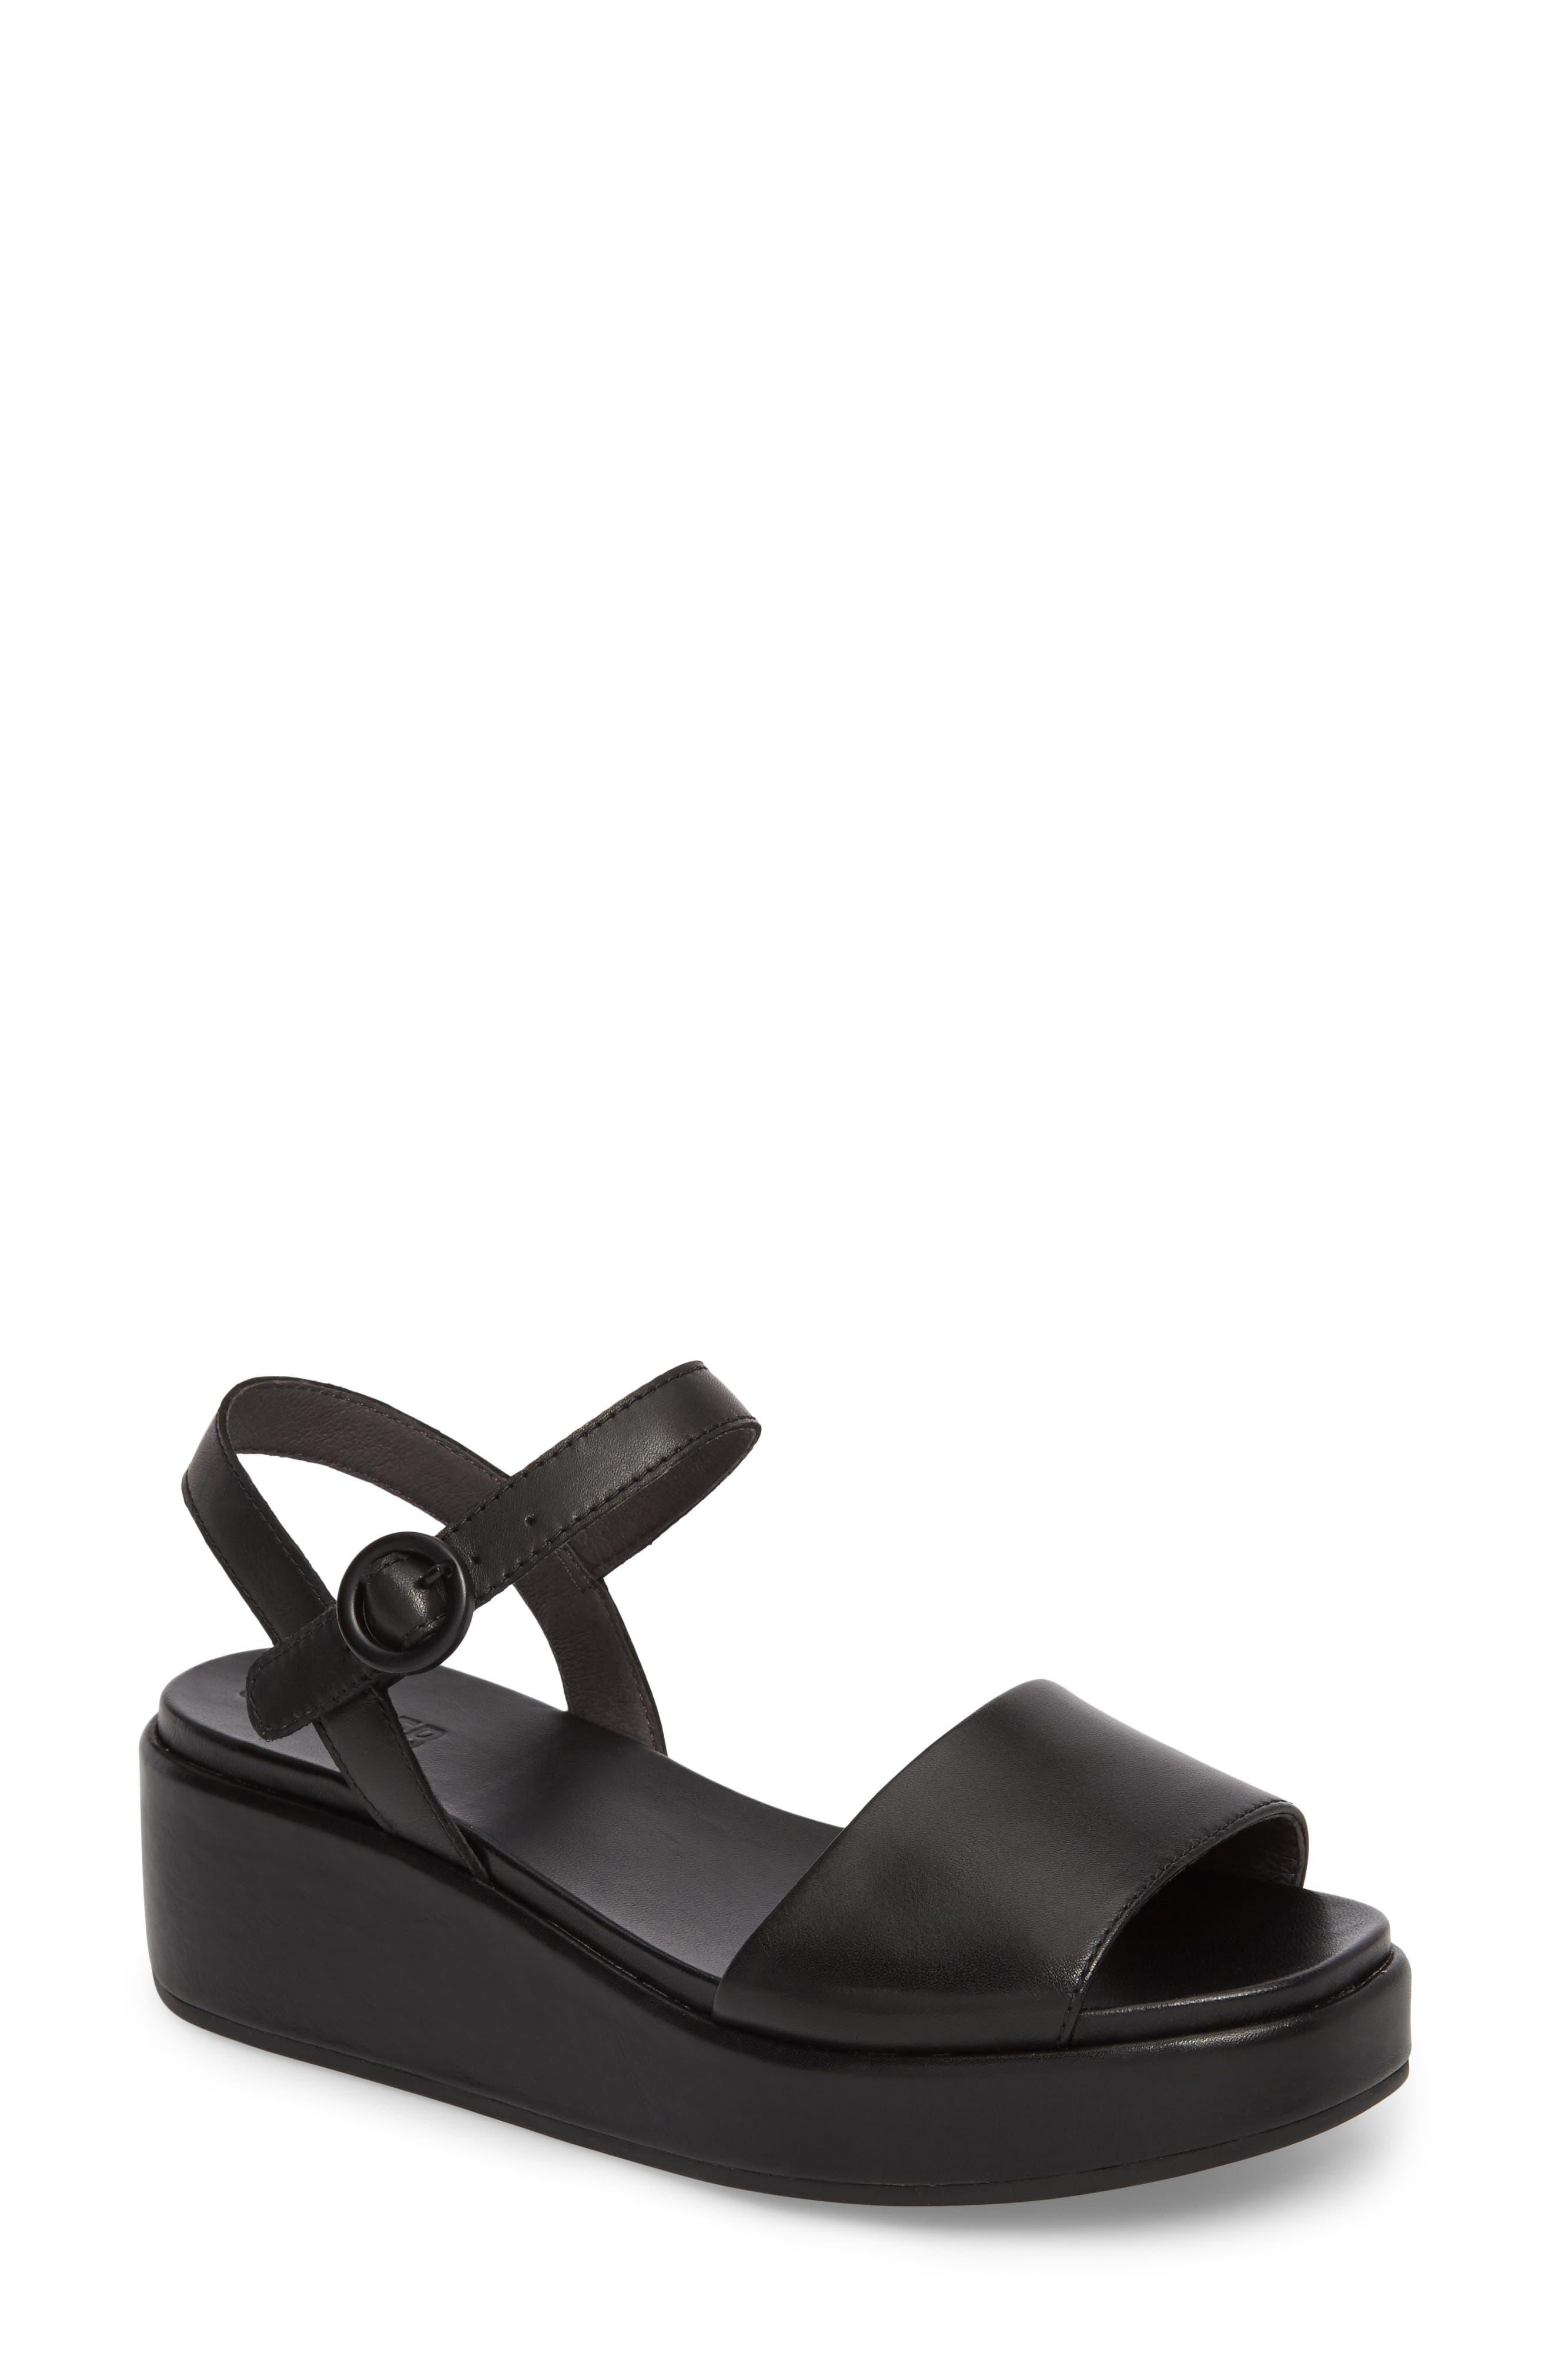 Misia Platform Wedge Sandal, Main, color, BLACK LEATHER